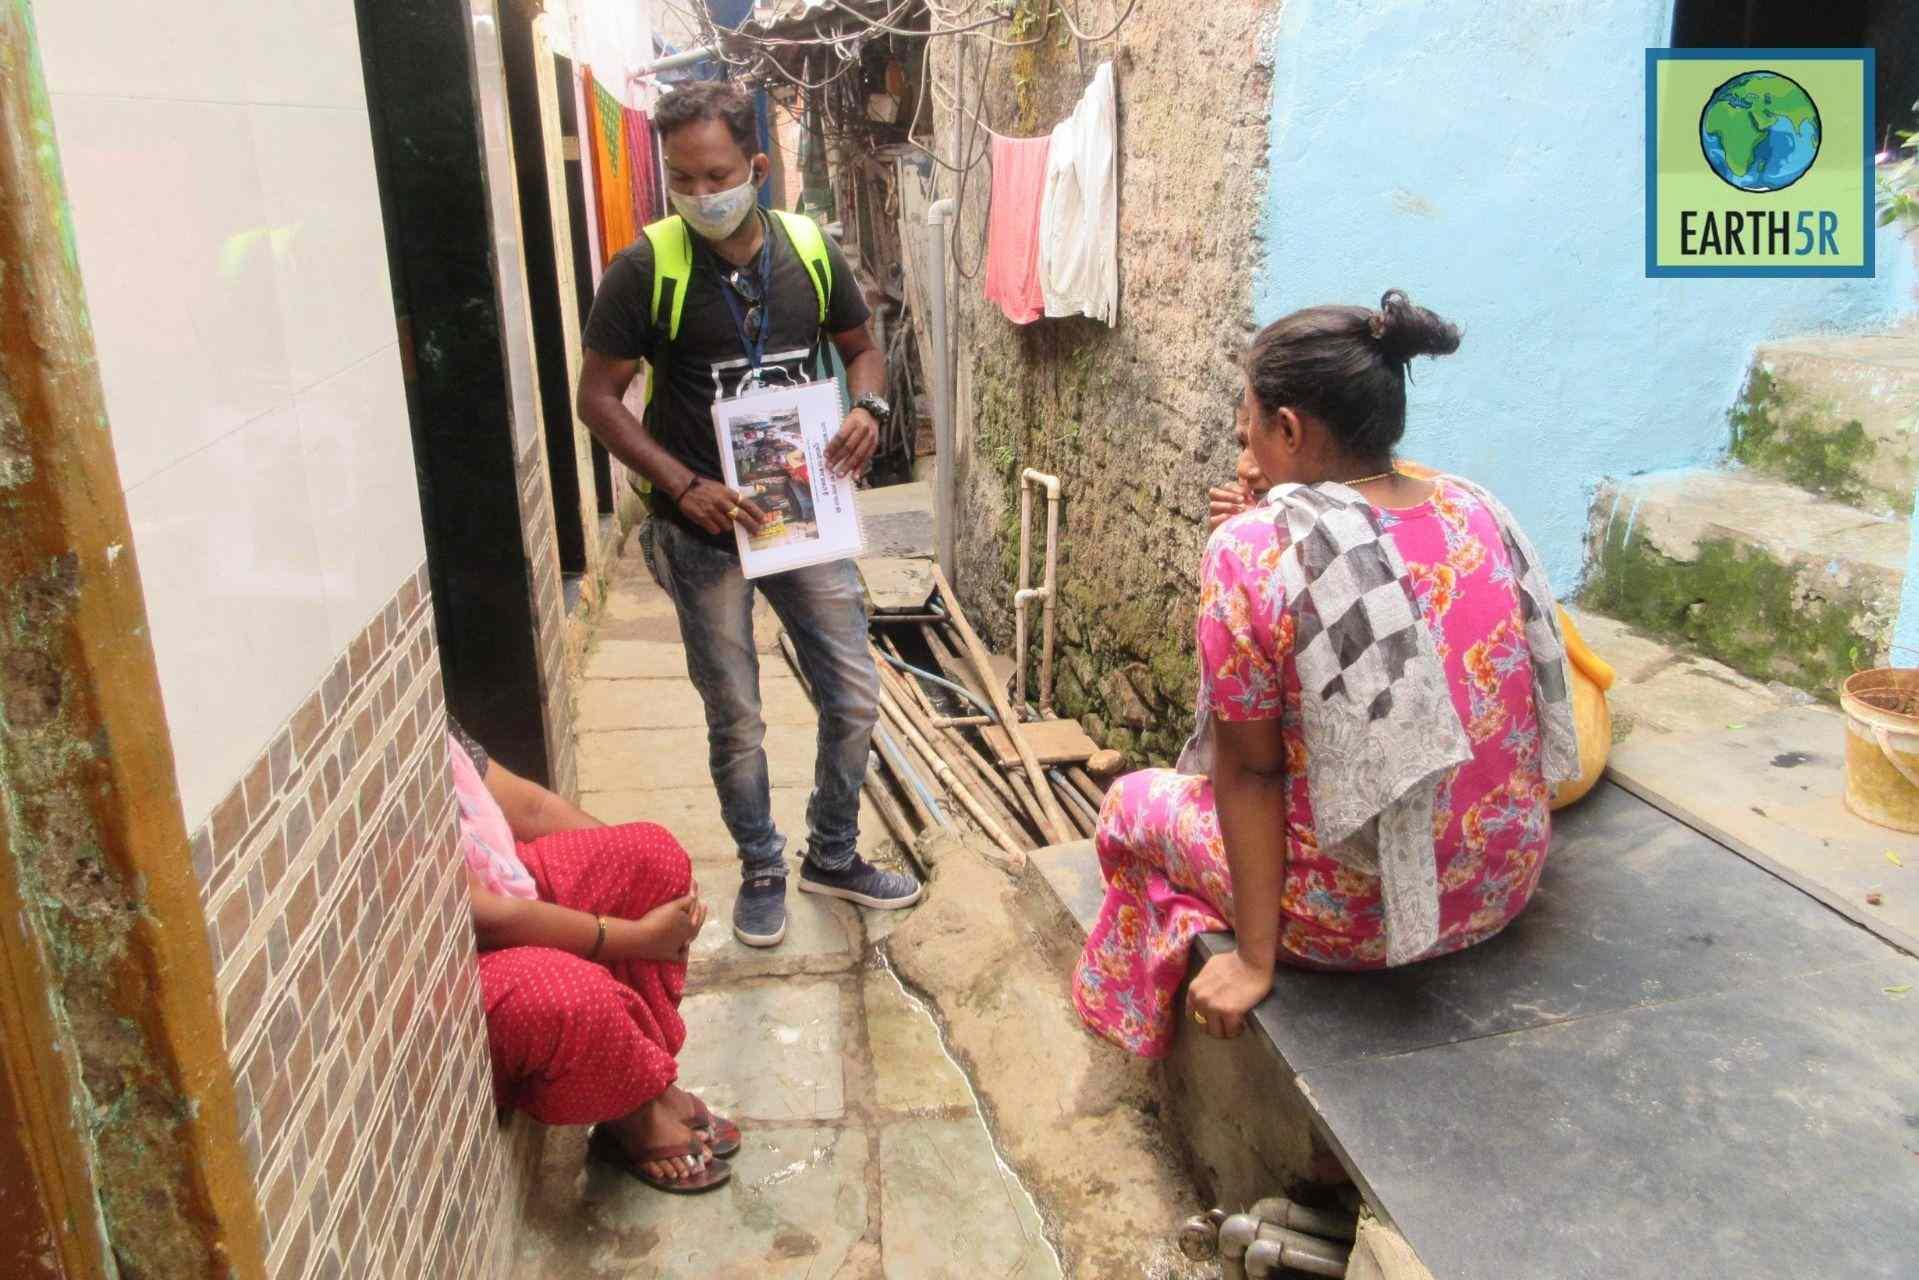 Mumbai-India-Environmental-NGO-Earth5r-Circular-Economy-home-equals-planet-volunteering